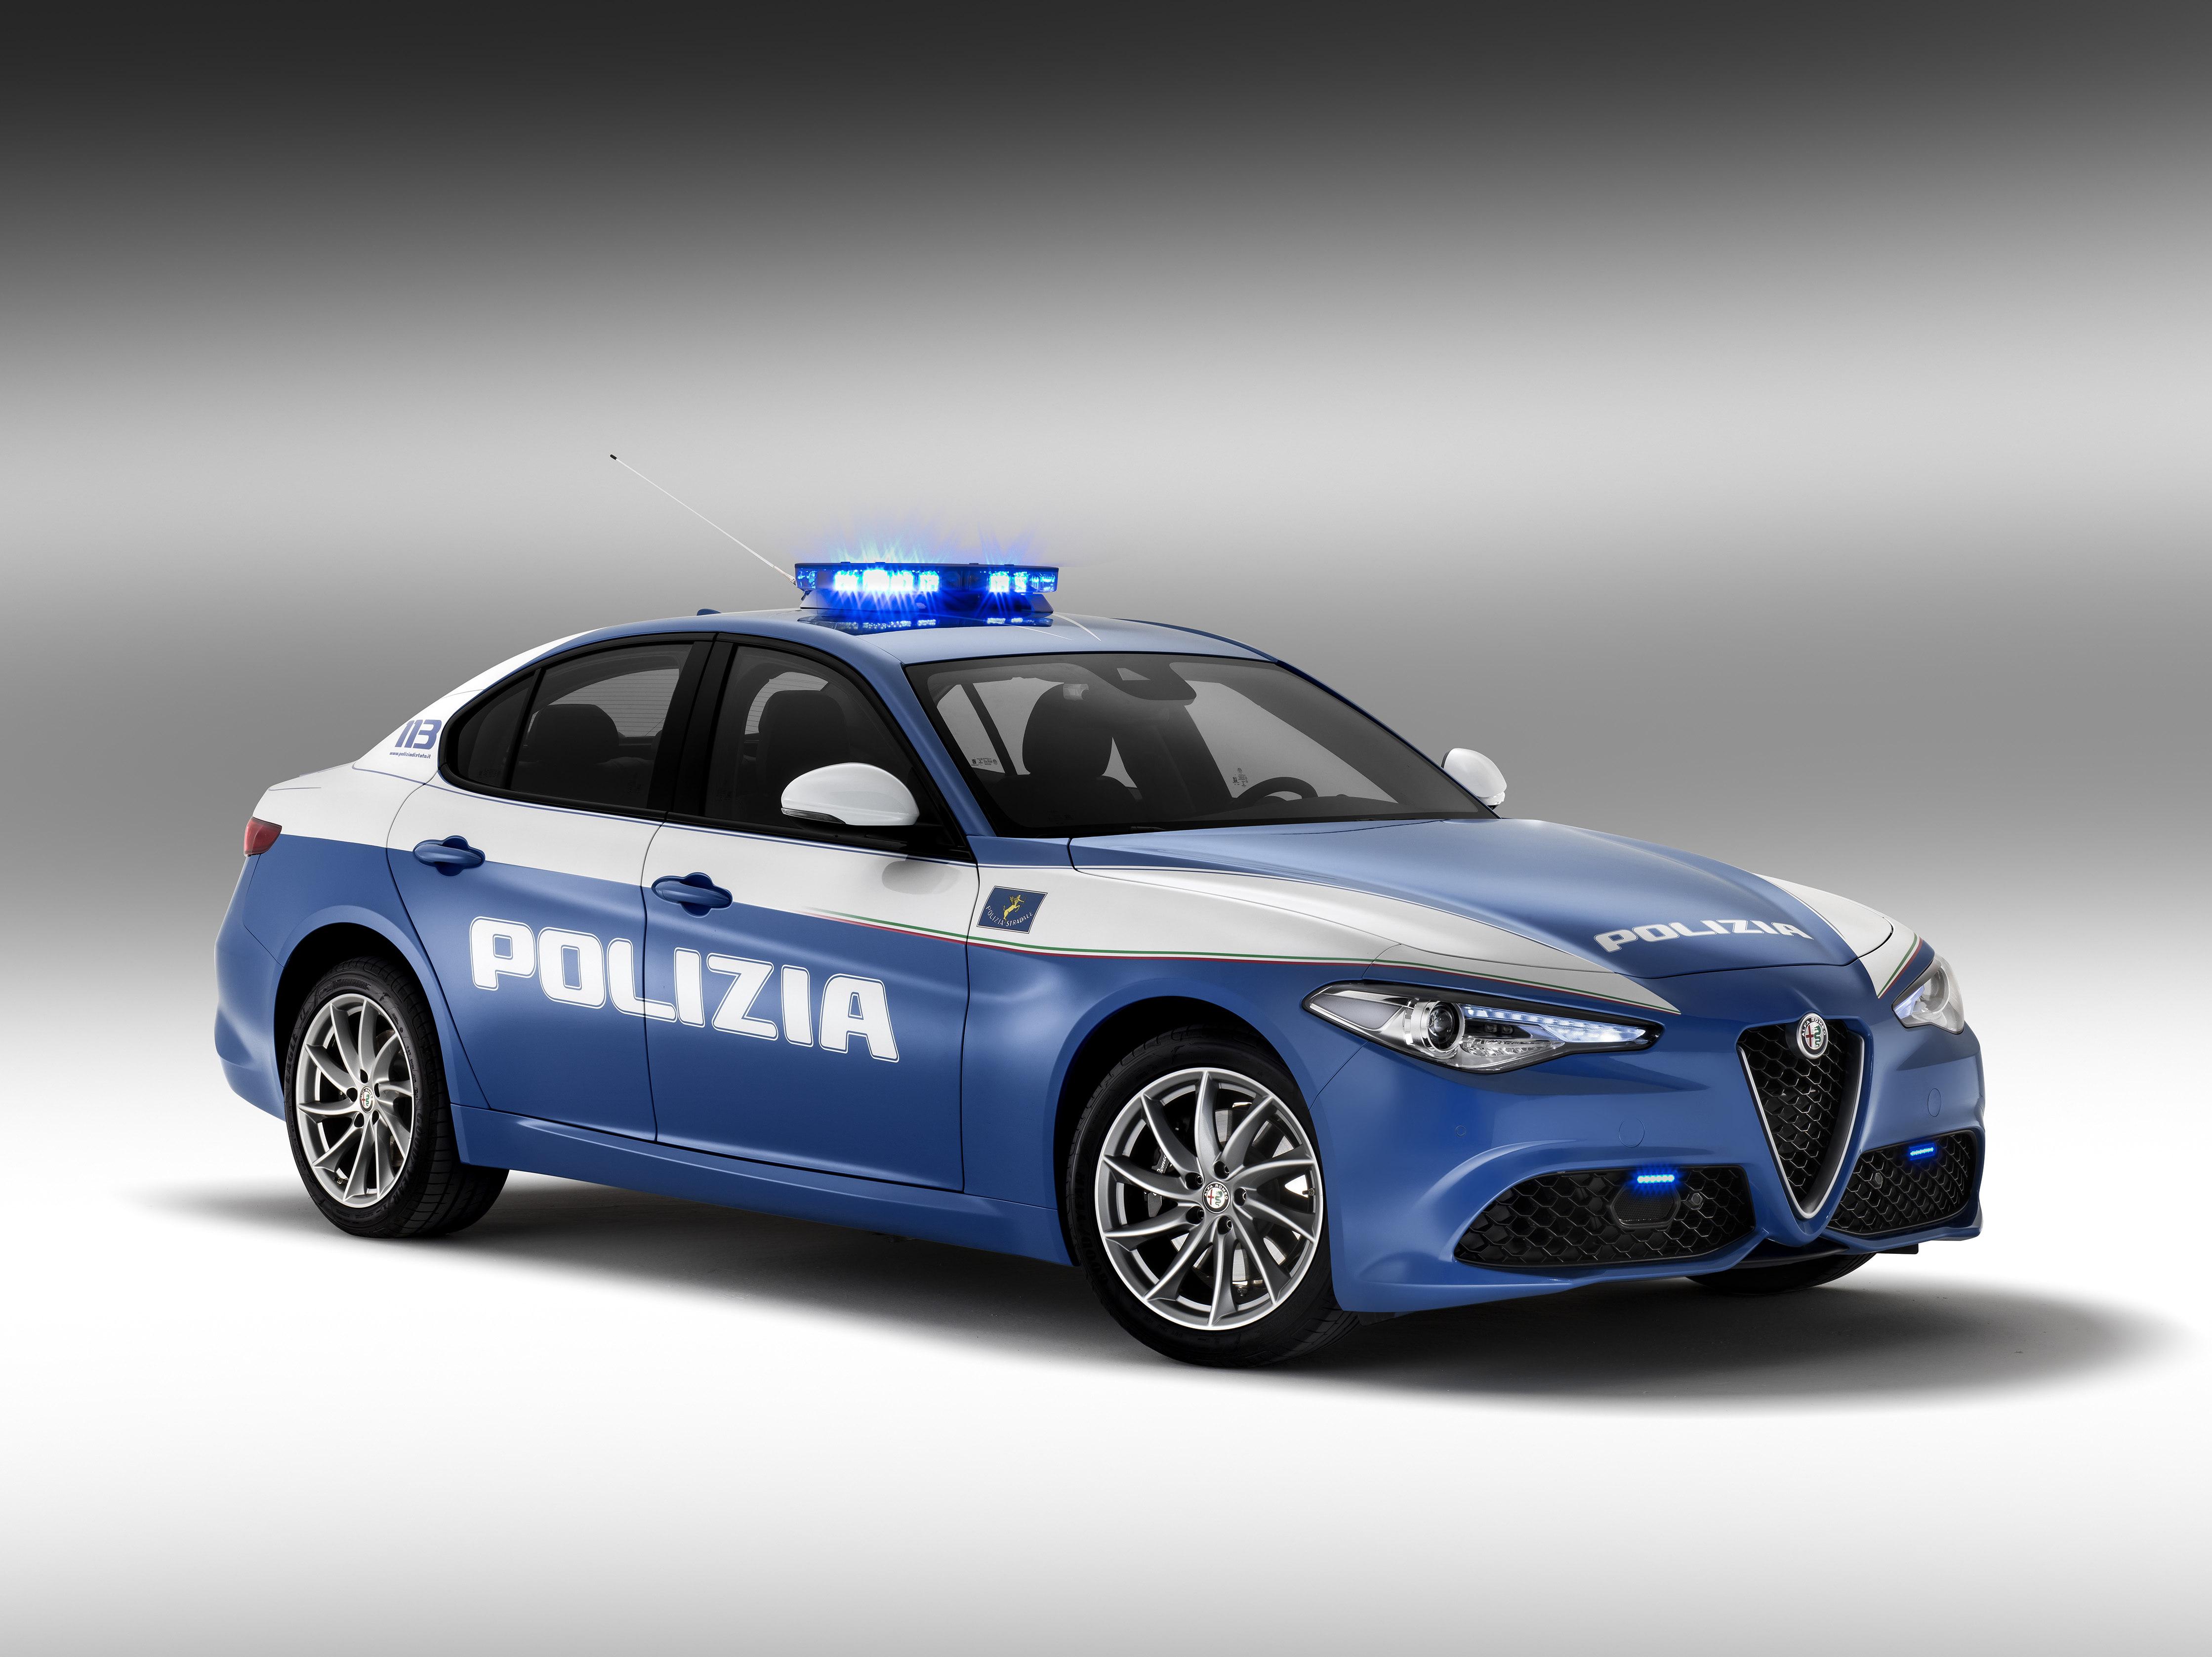 Alfa Romeo Polizia